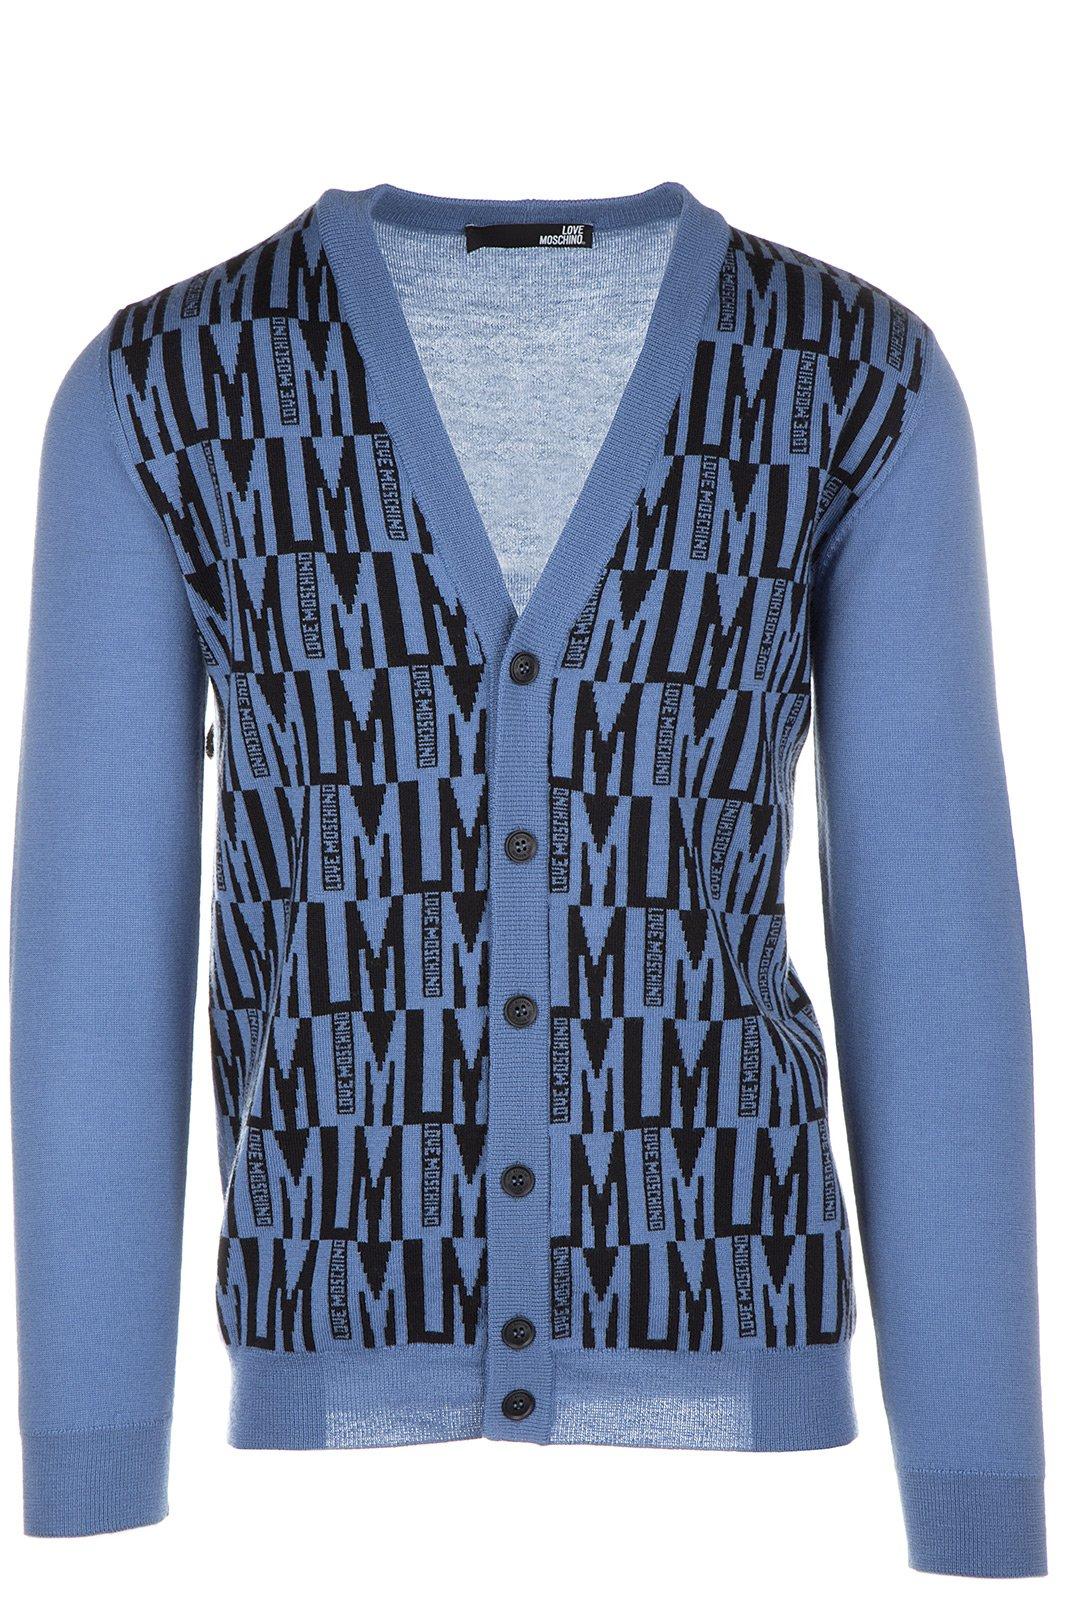 Love Moschino Cardigan Men's Jumper Sweater Pullover Blu US Size M (US M) M S 4J9 00 X 0478 40